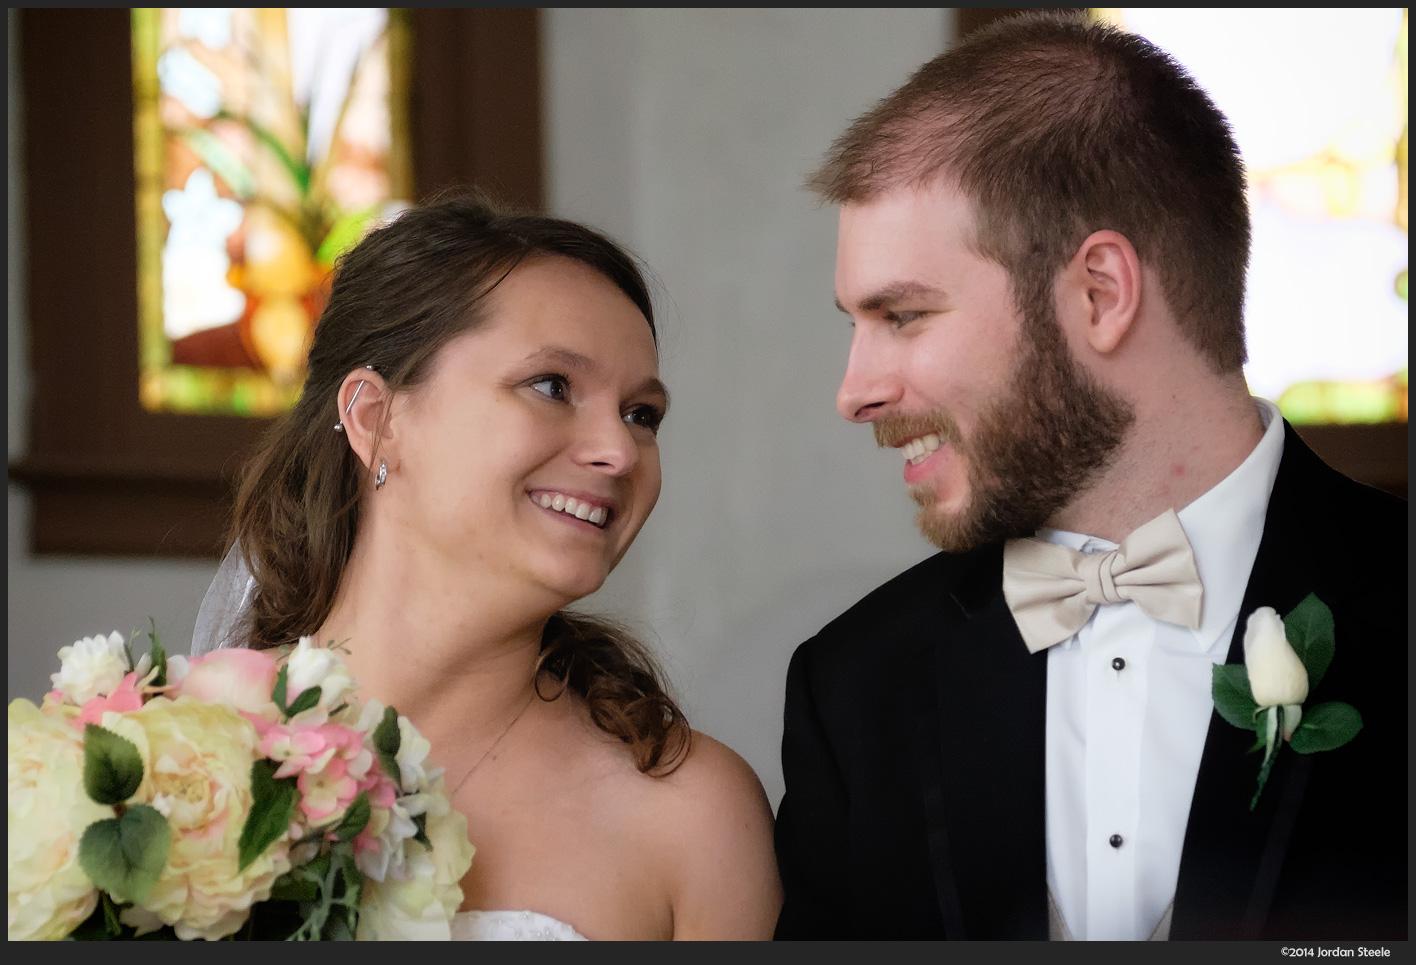 carry_wedding4.jpg